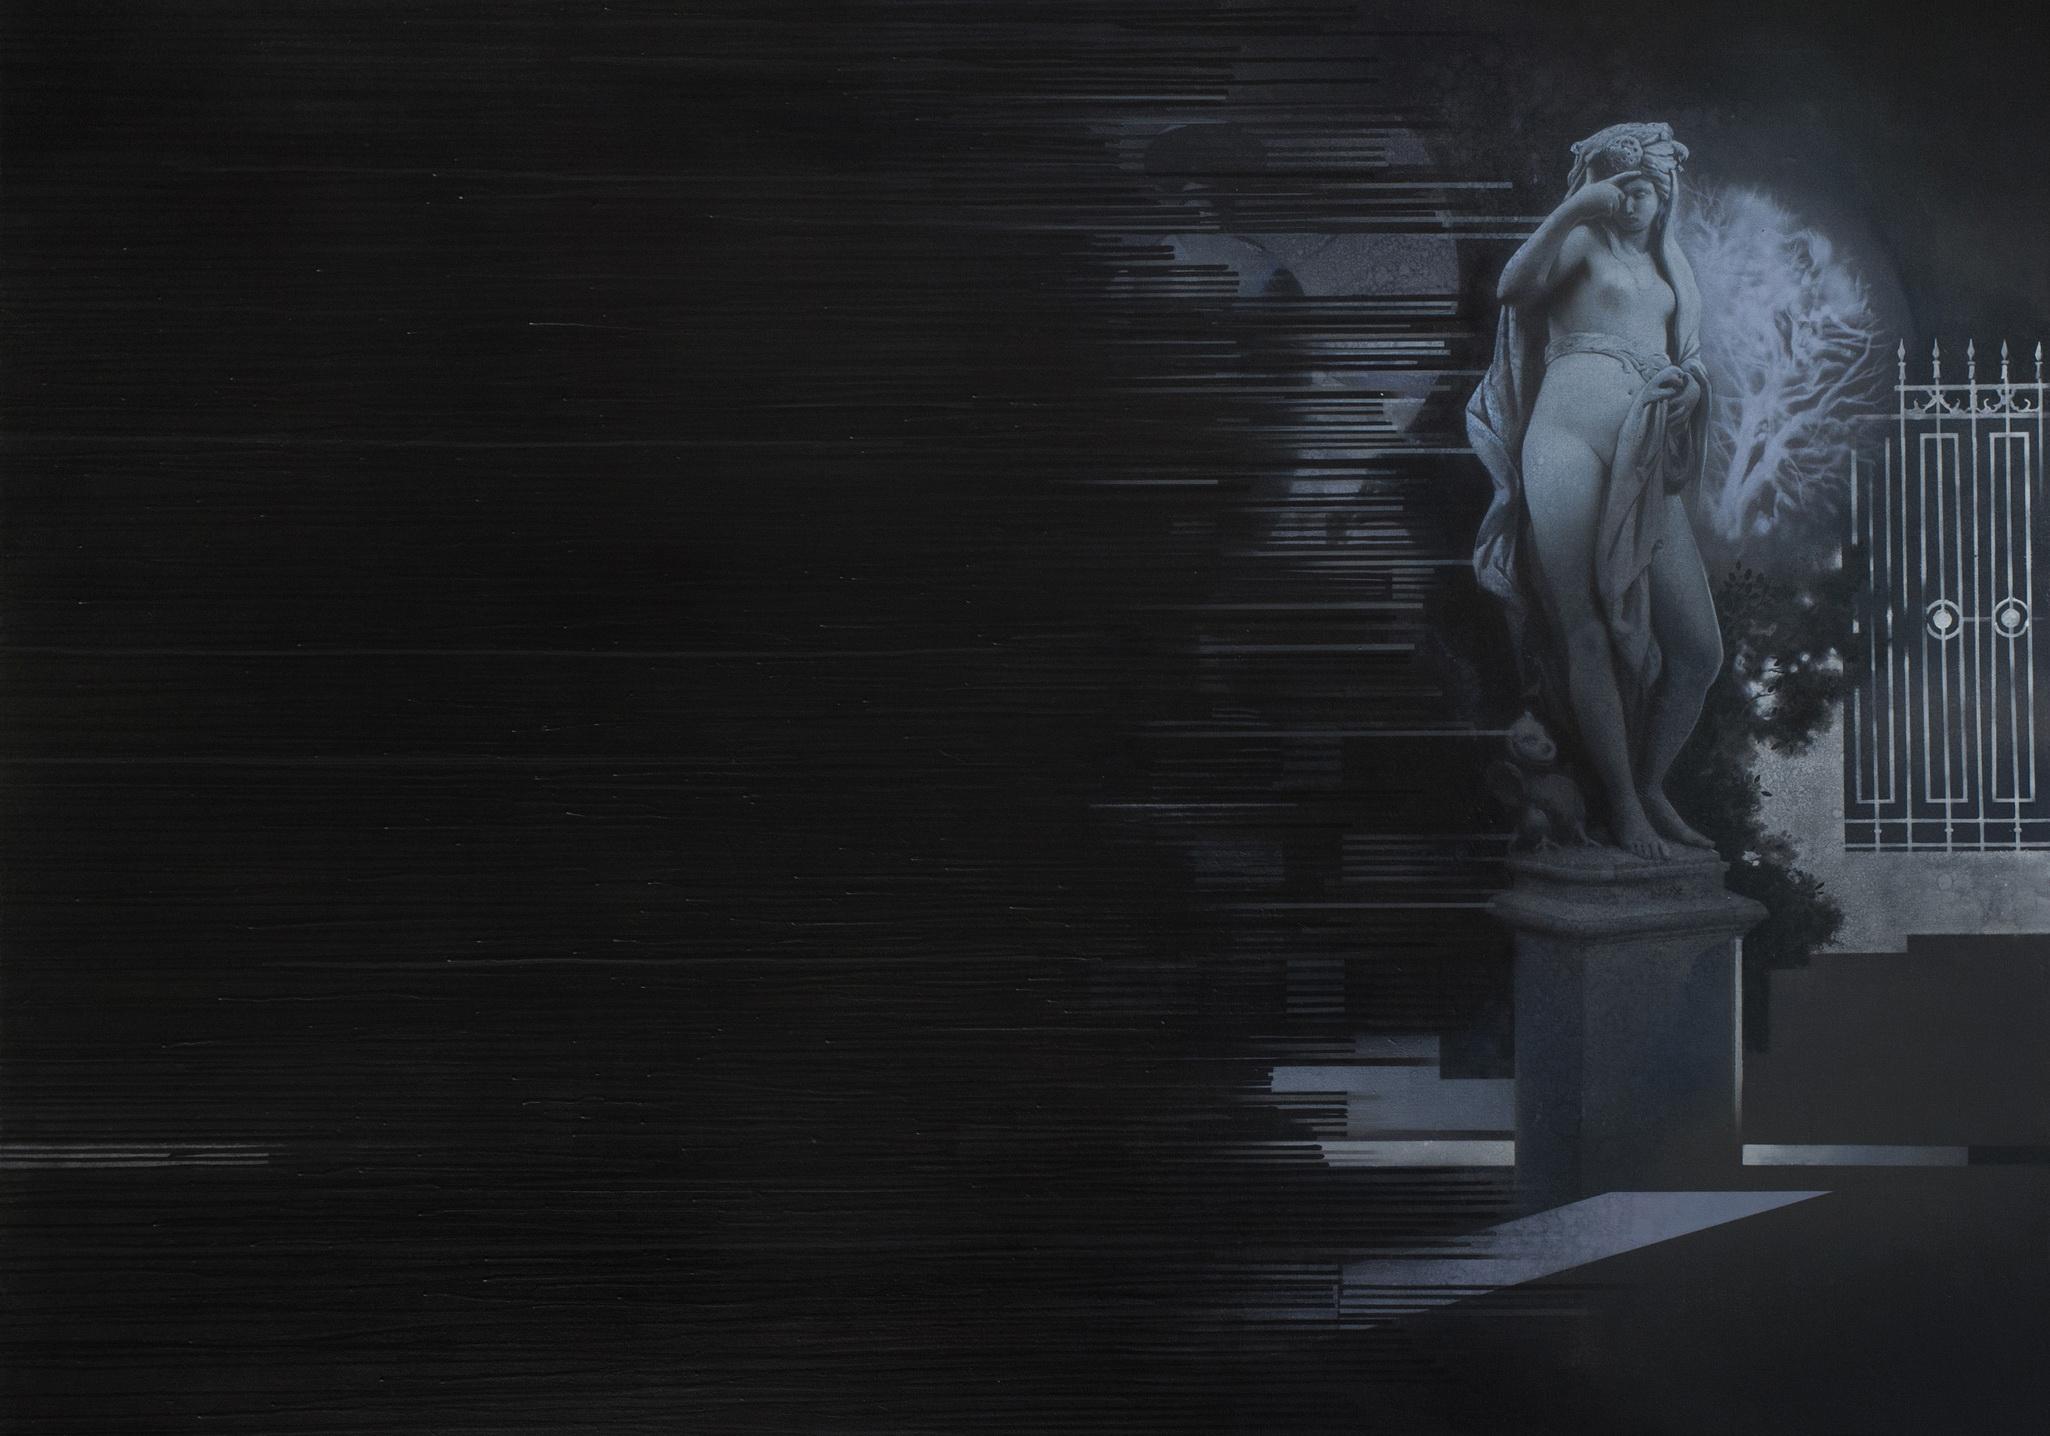 T'ma. (Digital darkness), 2016-2018, Acrylic on canvas, 135 x 92 cm, $1500